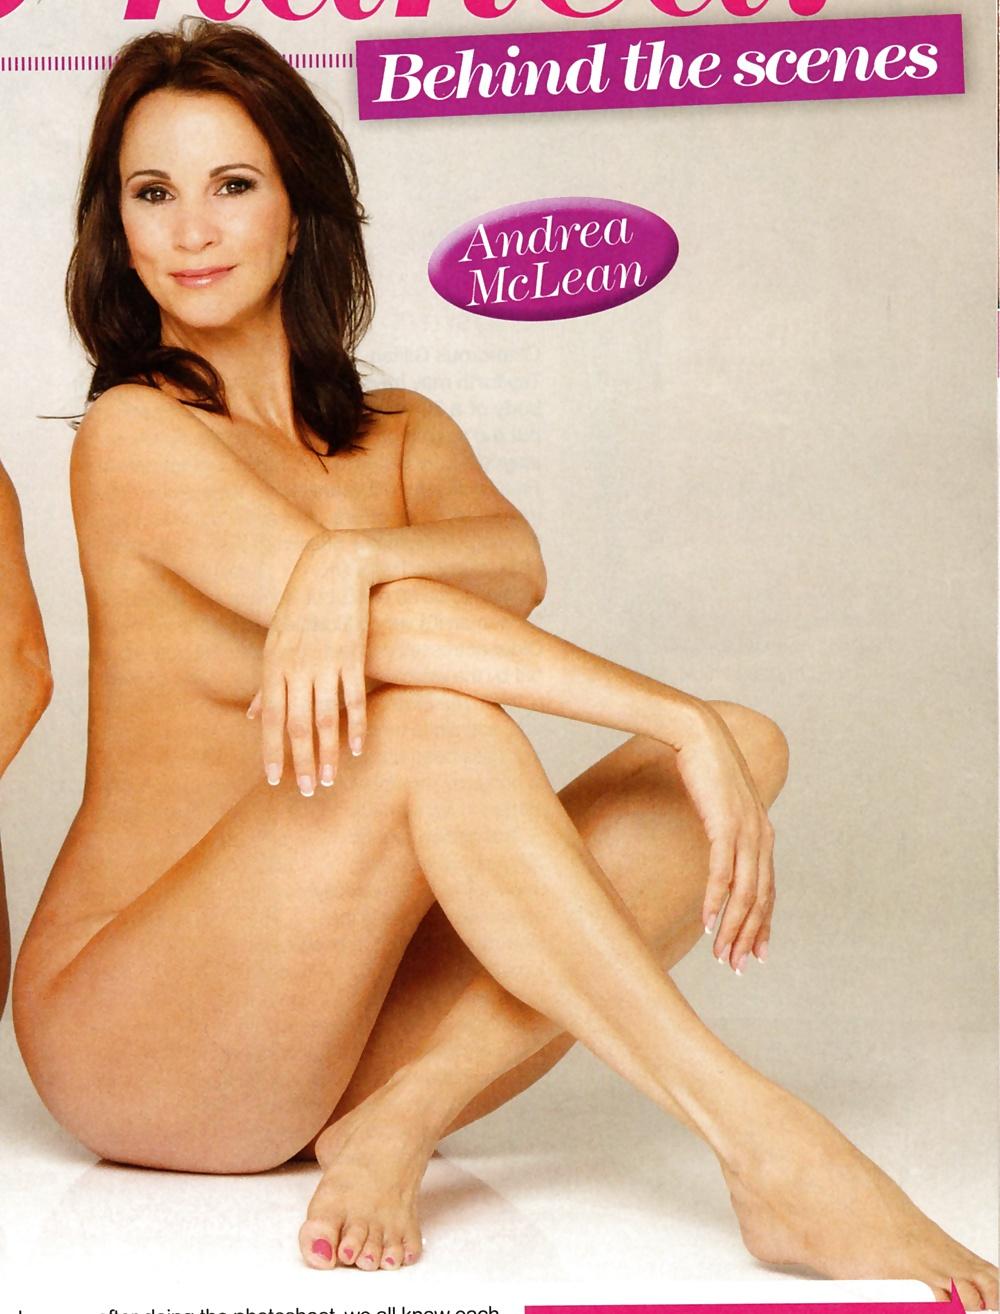 Andrea Mclean Topless andrea mclean tasty milf - 26 pics - xhamster